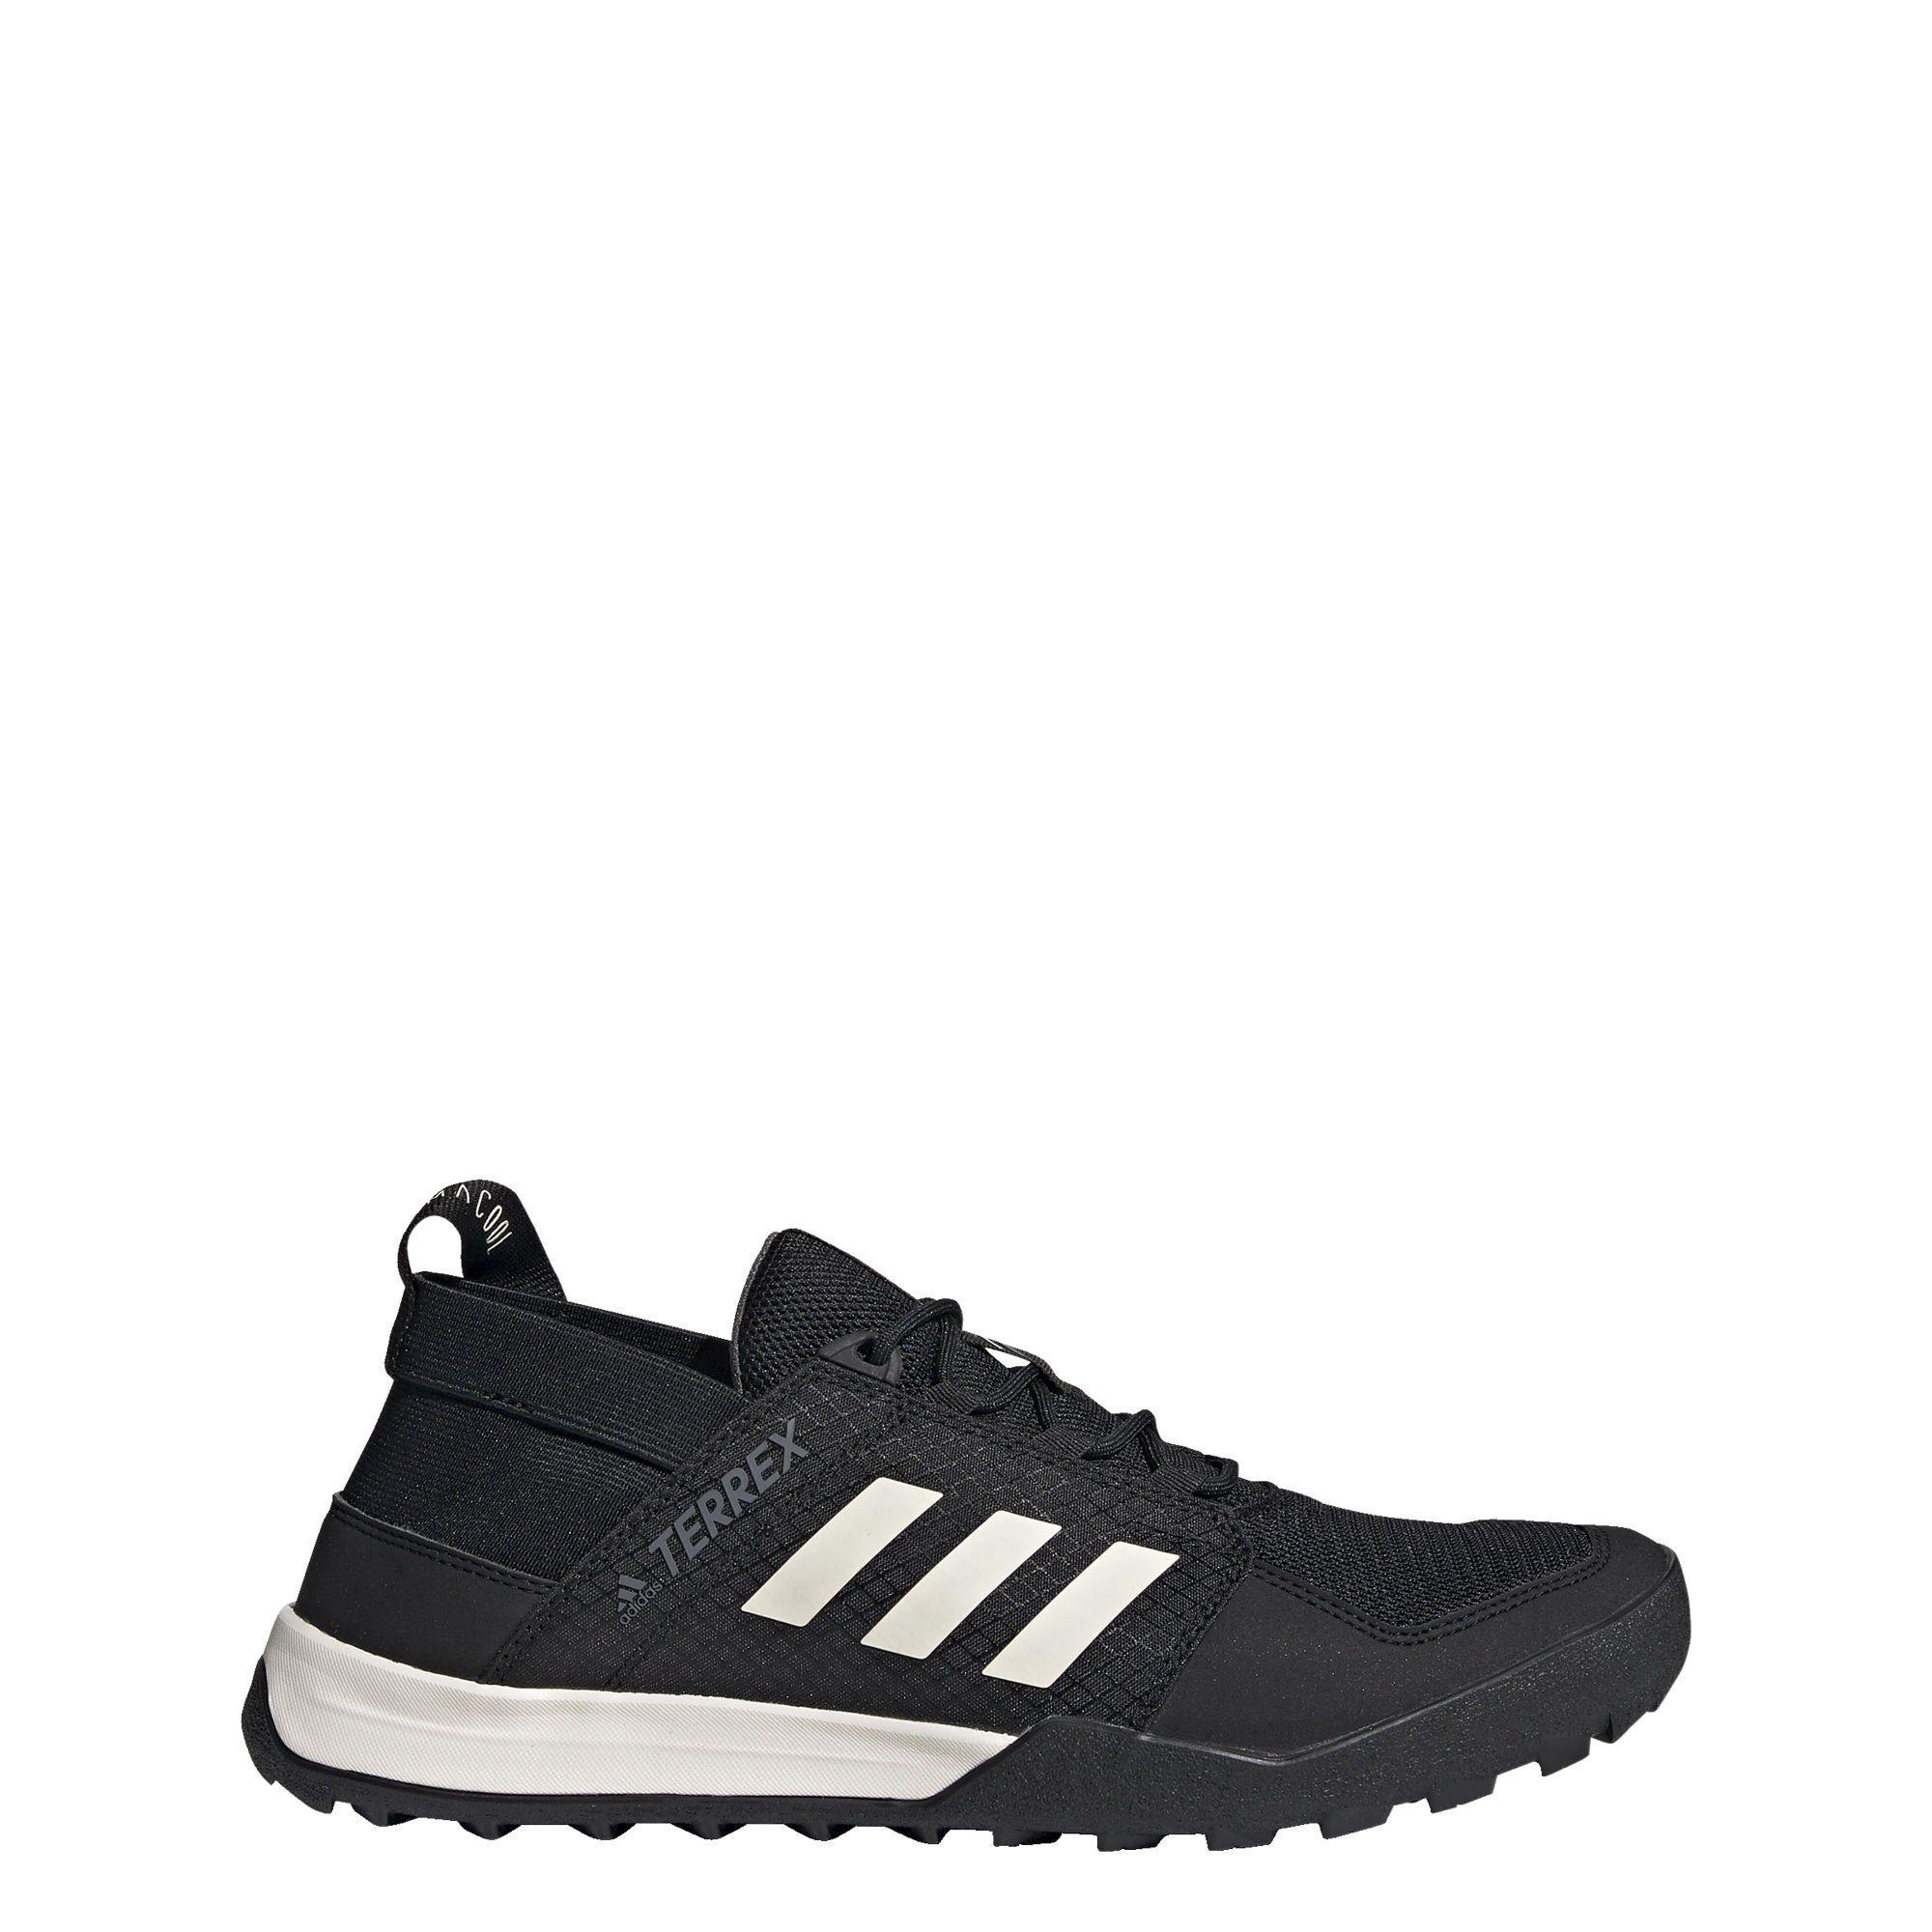 Sportschuhe Adidas Daroga 2.0 Climacool Schuhe Herren